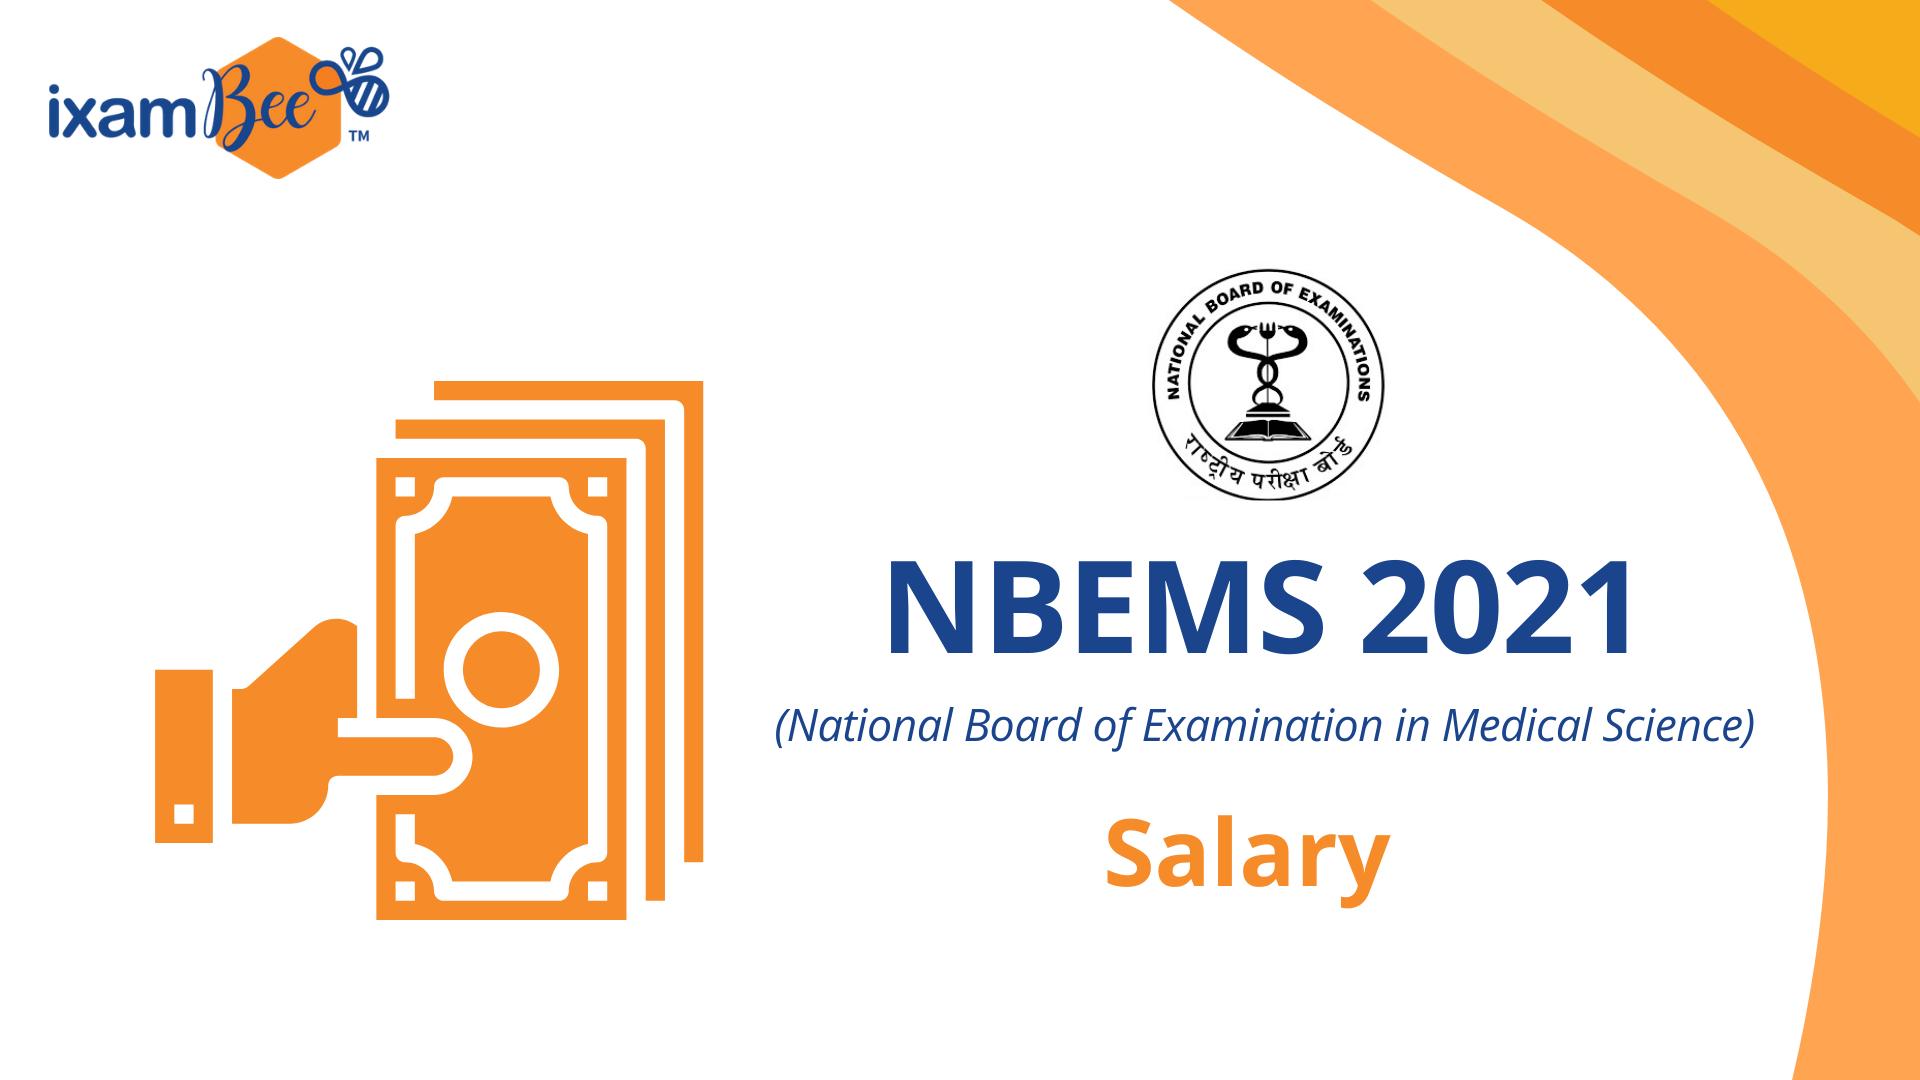 NBEMS Salary